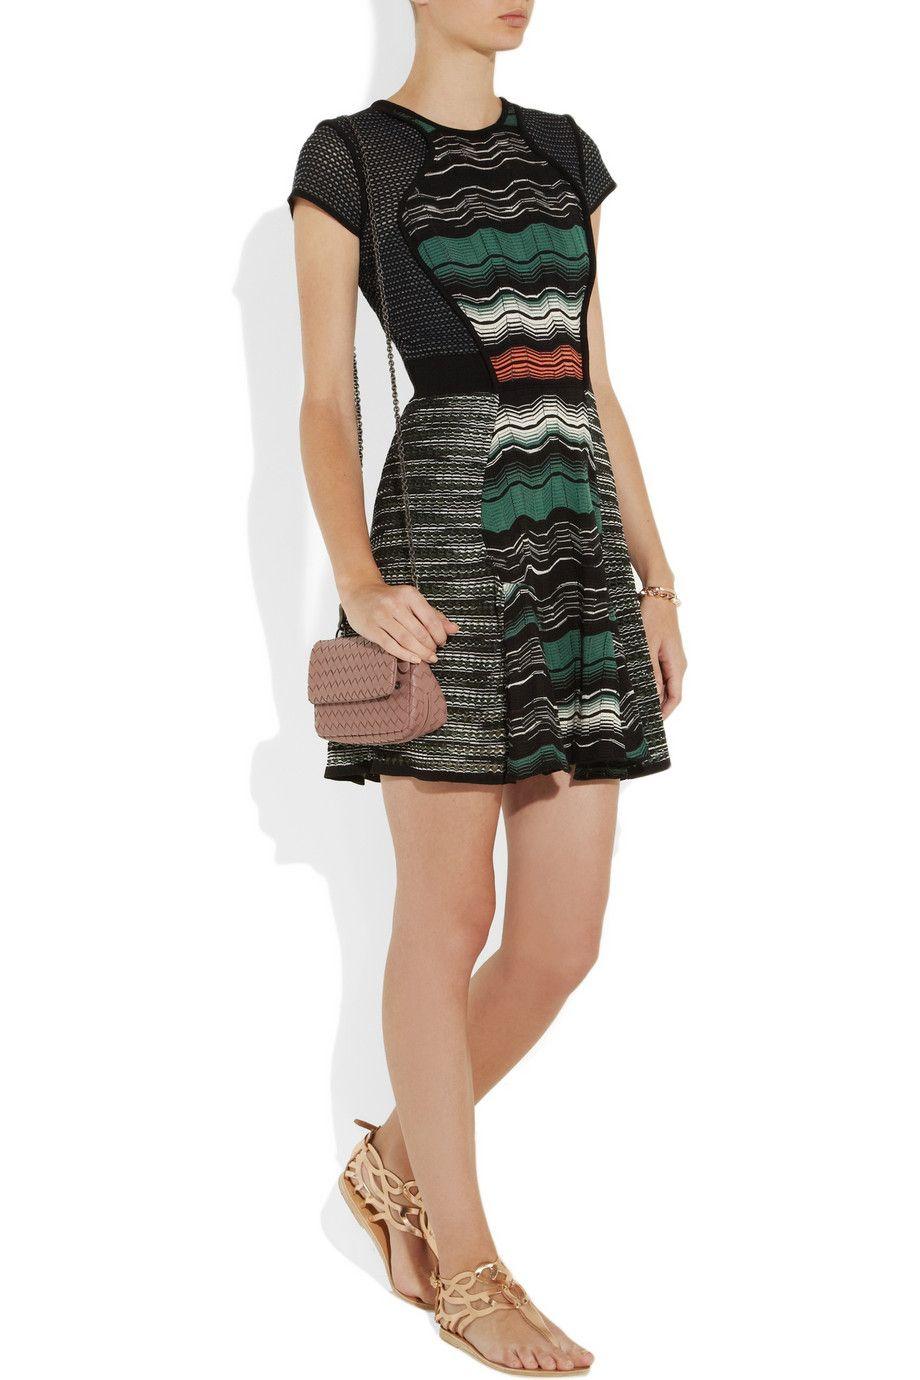 M Missoni | Crochet-knit dress | NET-A-PORTER.COM